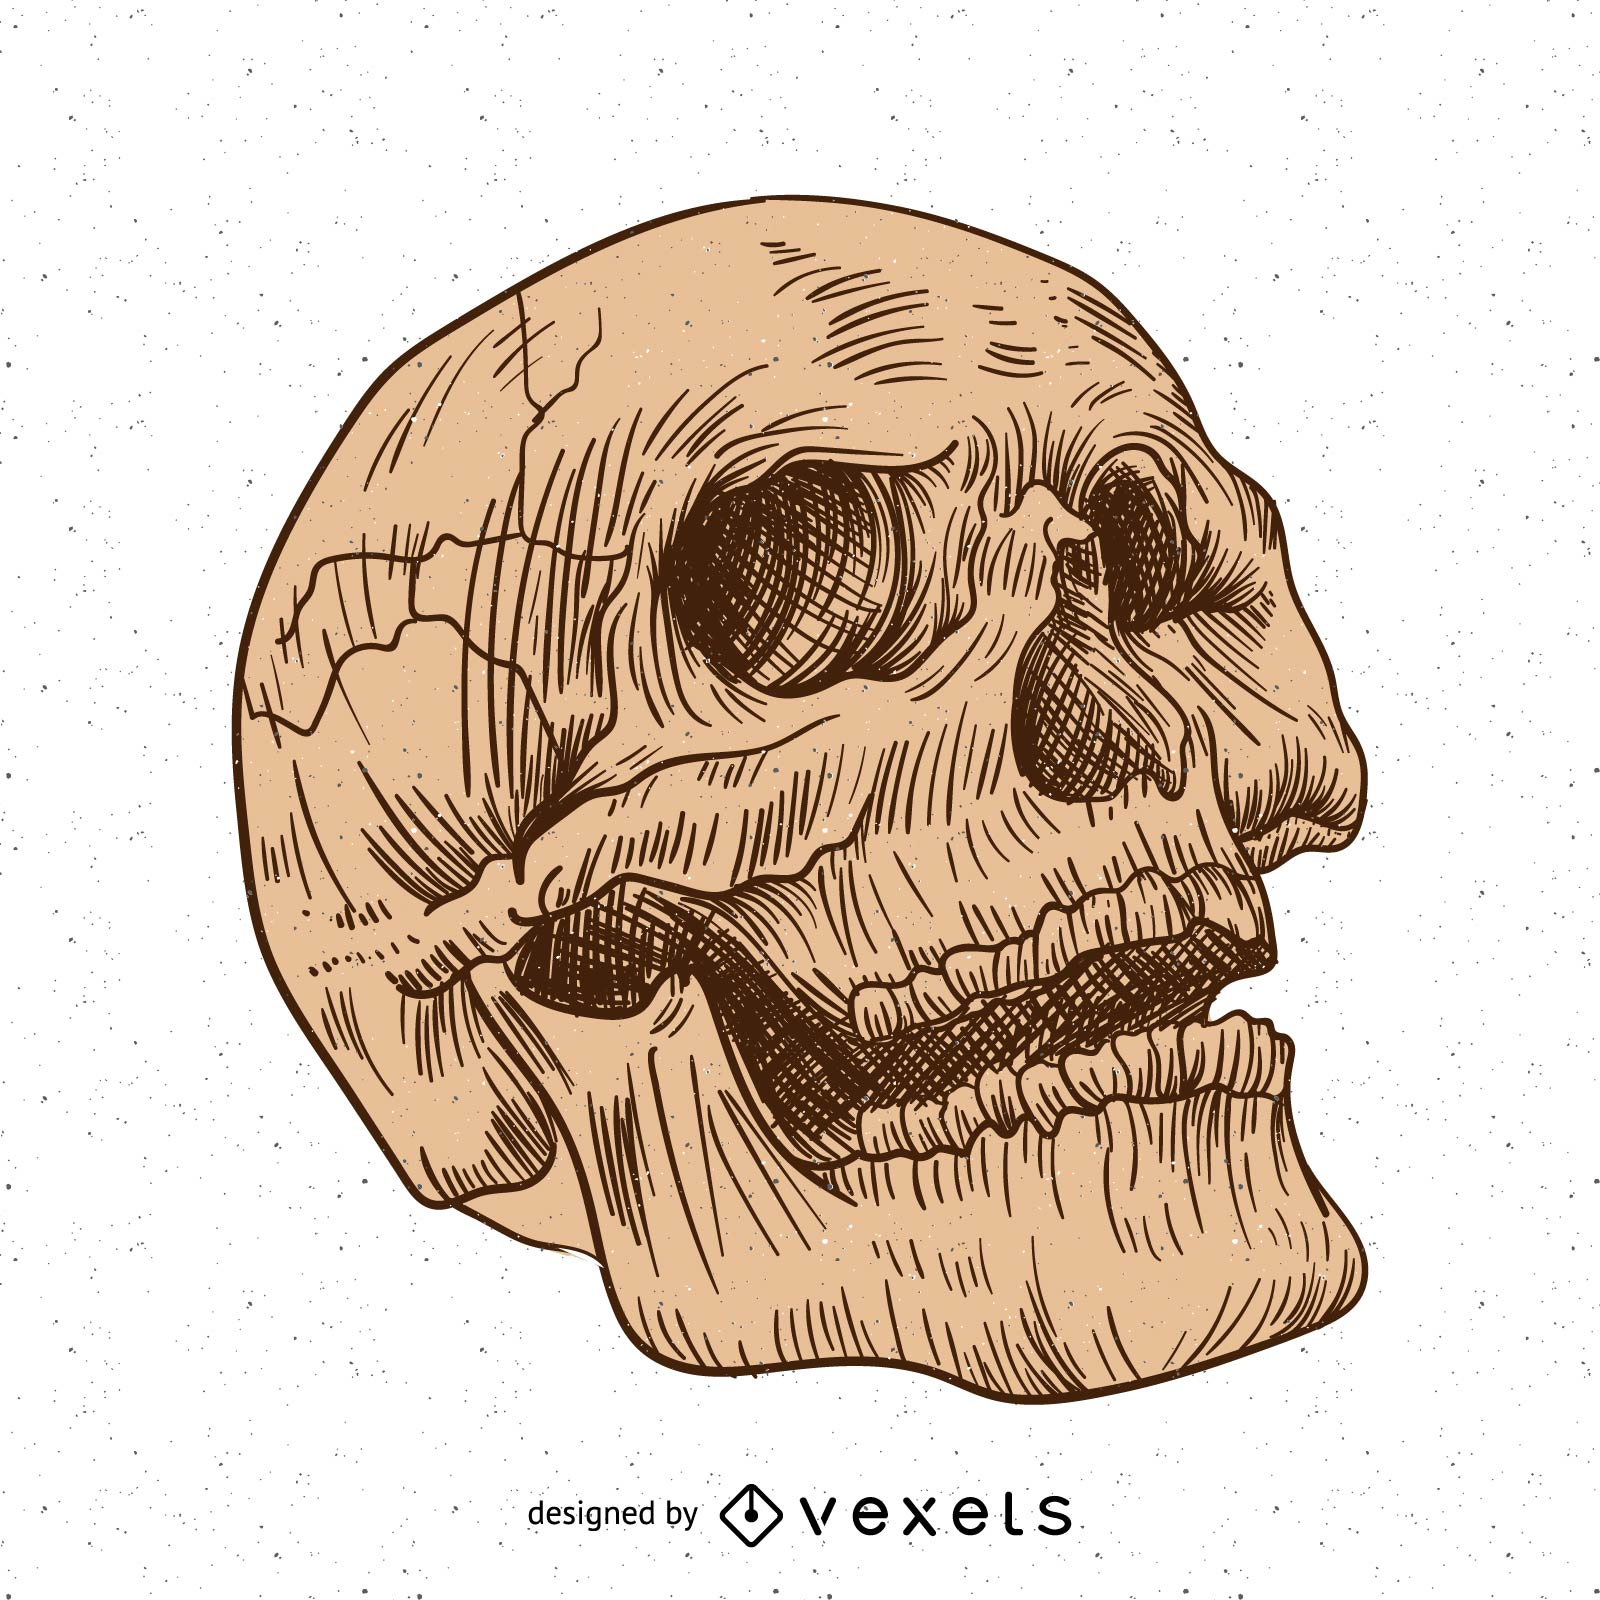 Artistic hand drawn skull design